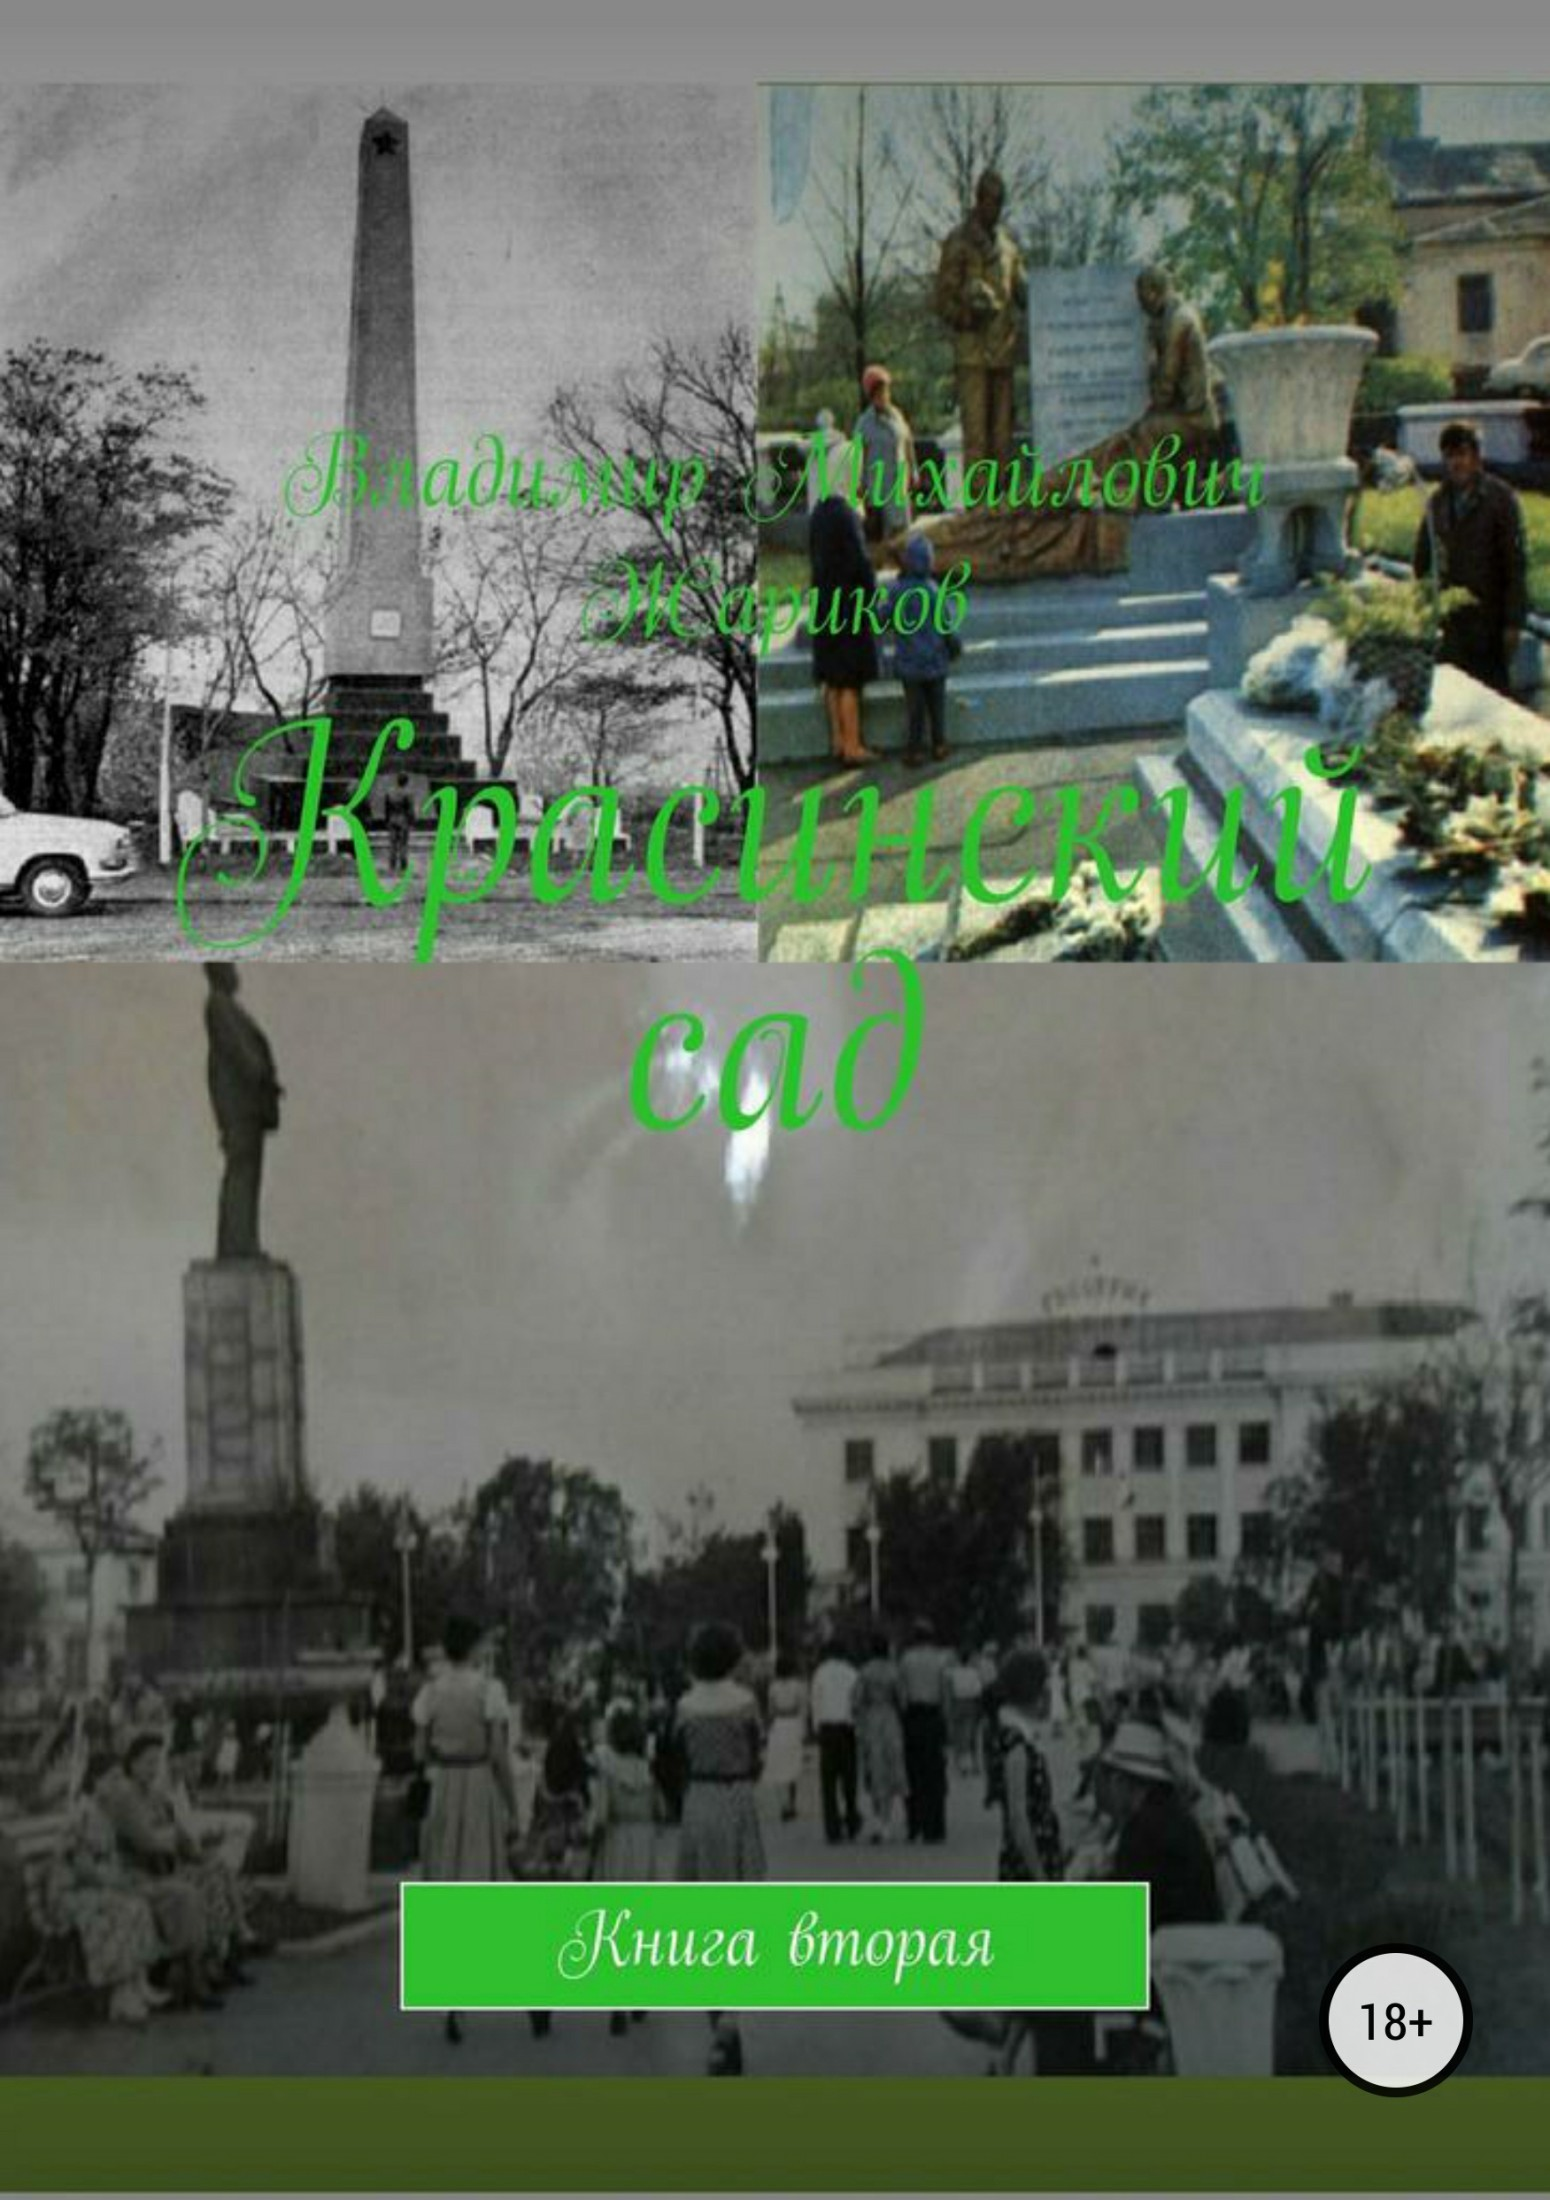 Владимир Михайлович Жариков Красинский сад. Книга 2 монитор г шахты